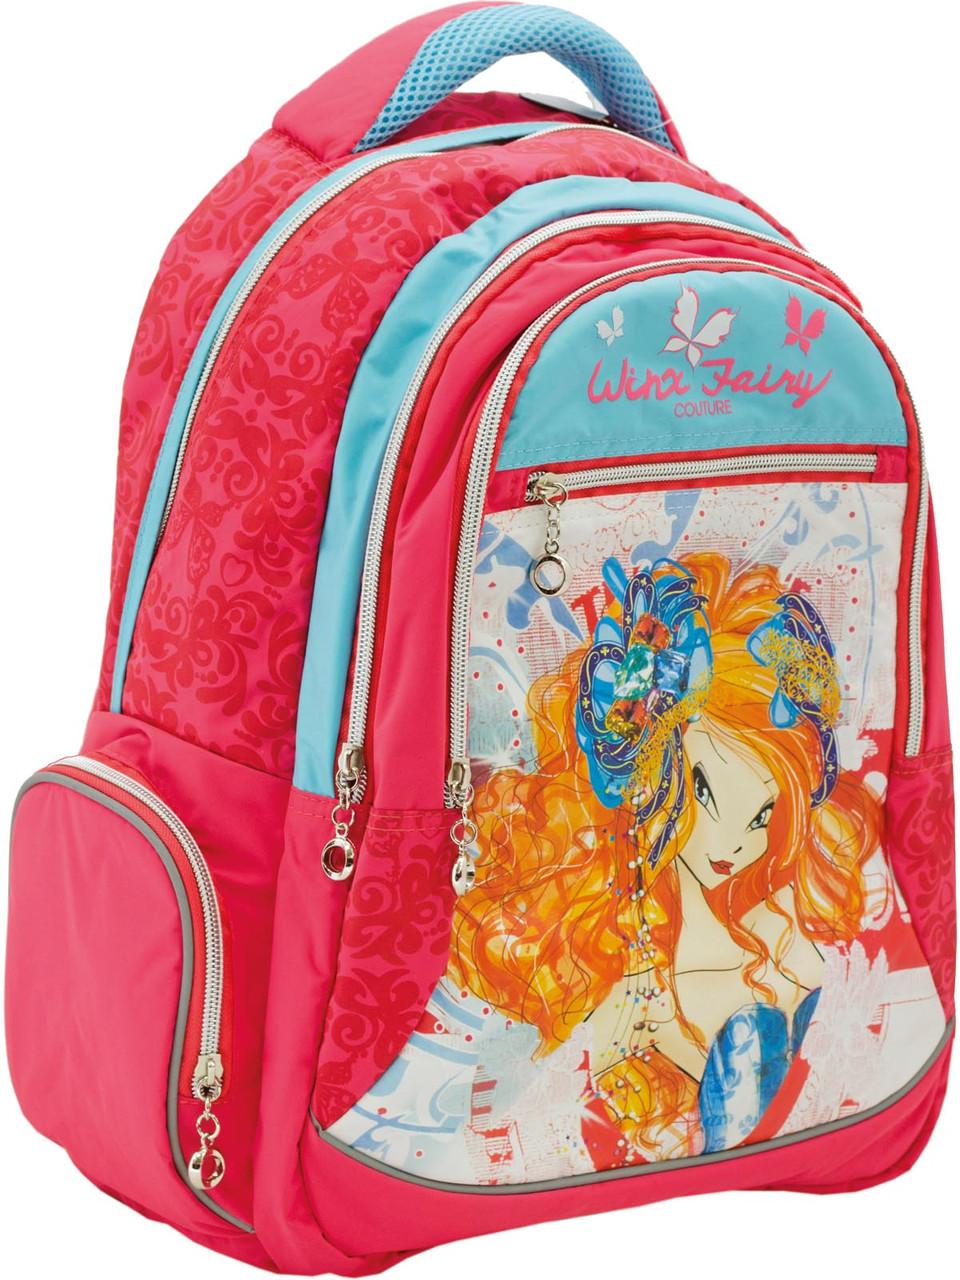 Рюкзаки winx с анатомической спинкой рюкзаки от шанель фото